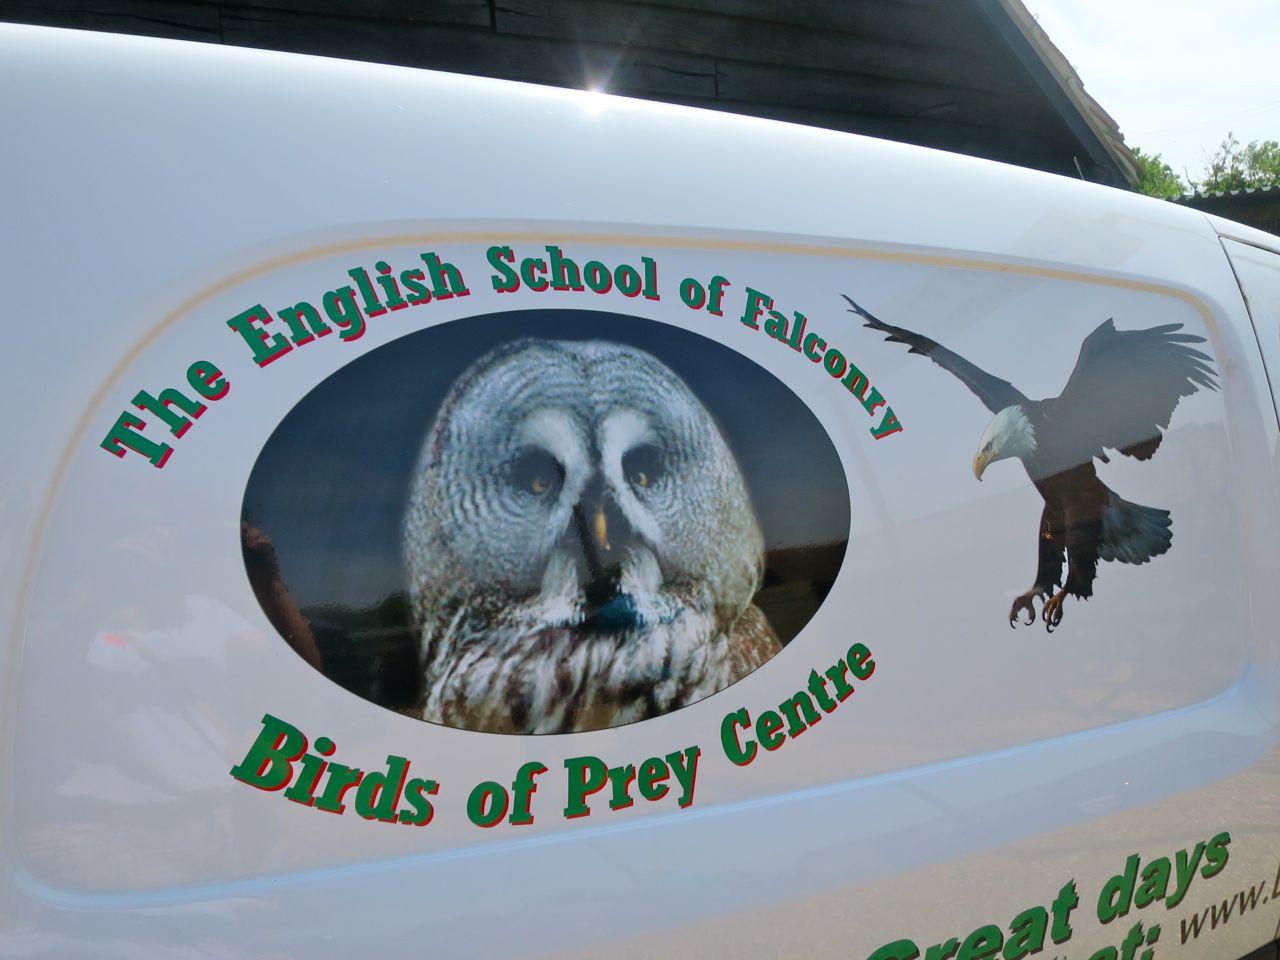 The English School of Falconry.